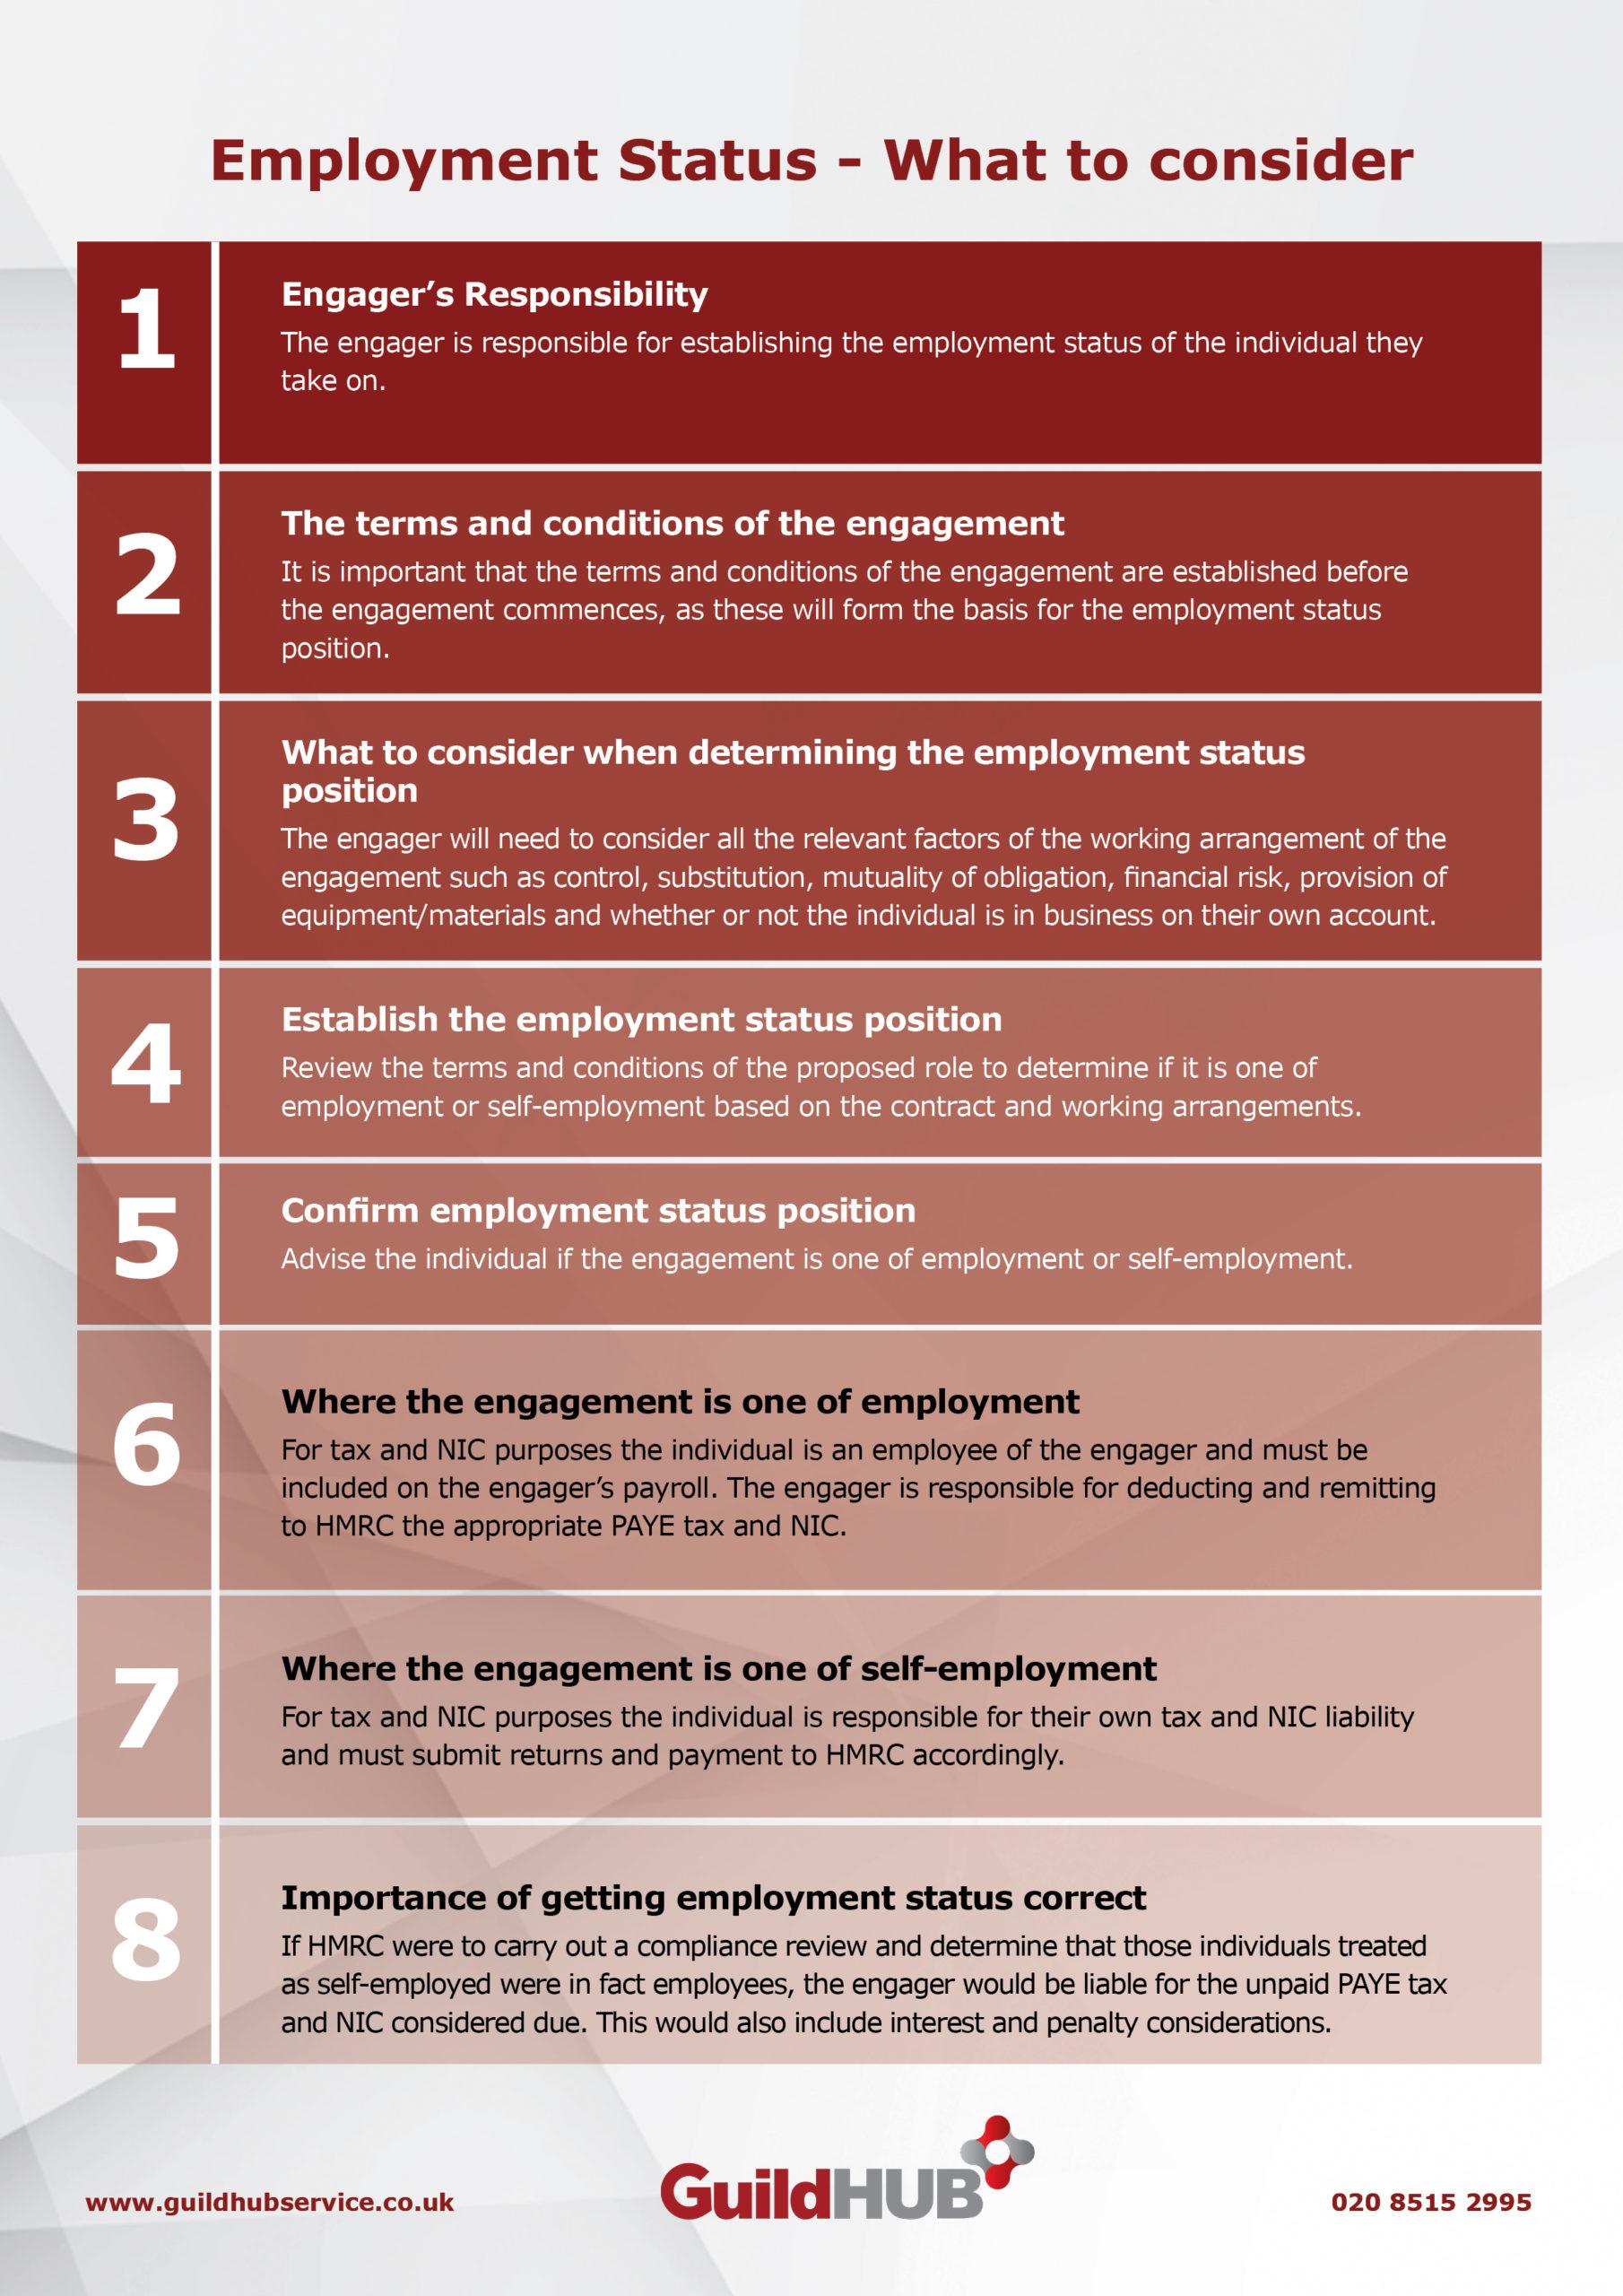 Employment-Status-What-to-consider-flowchart